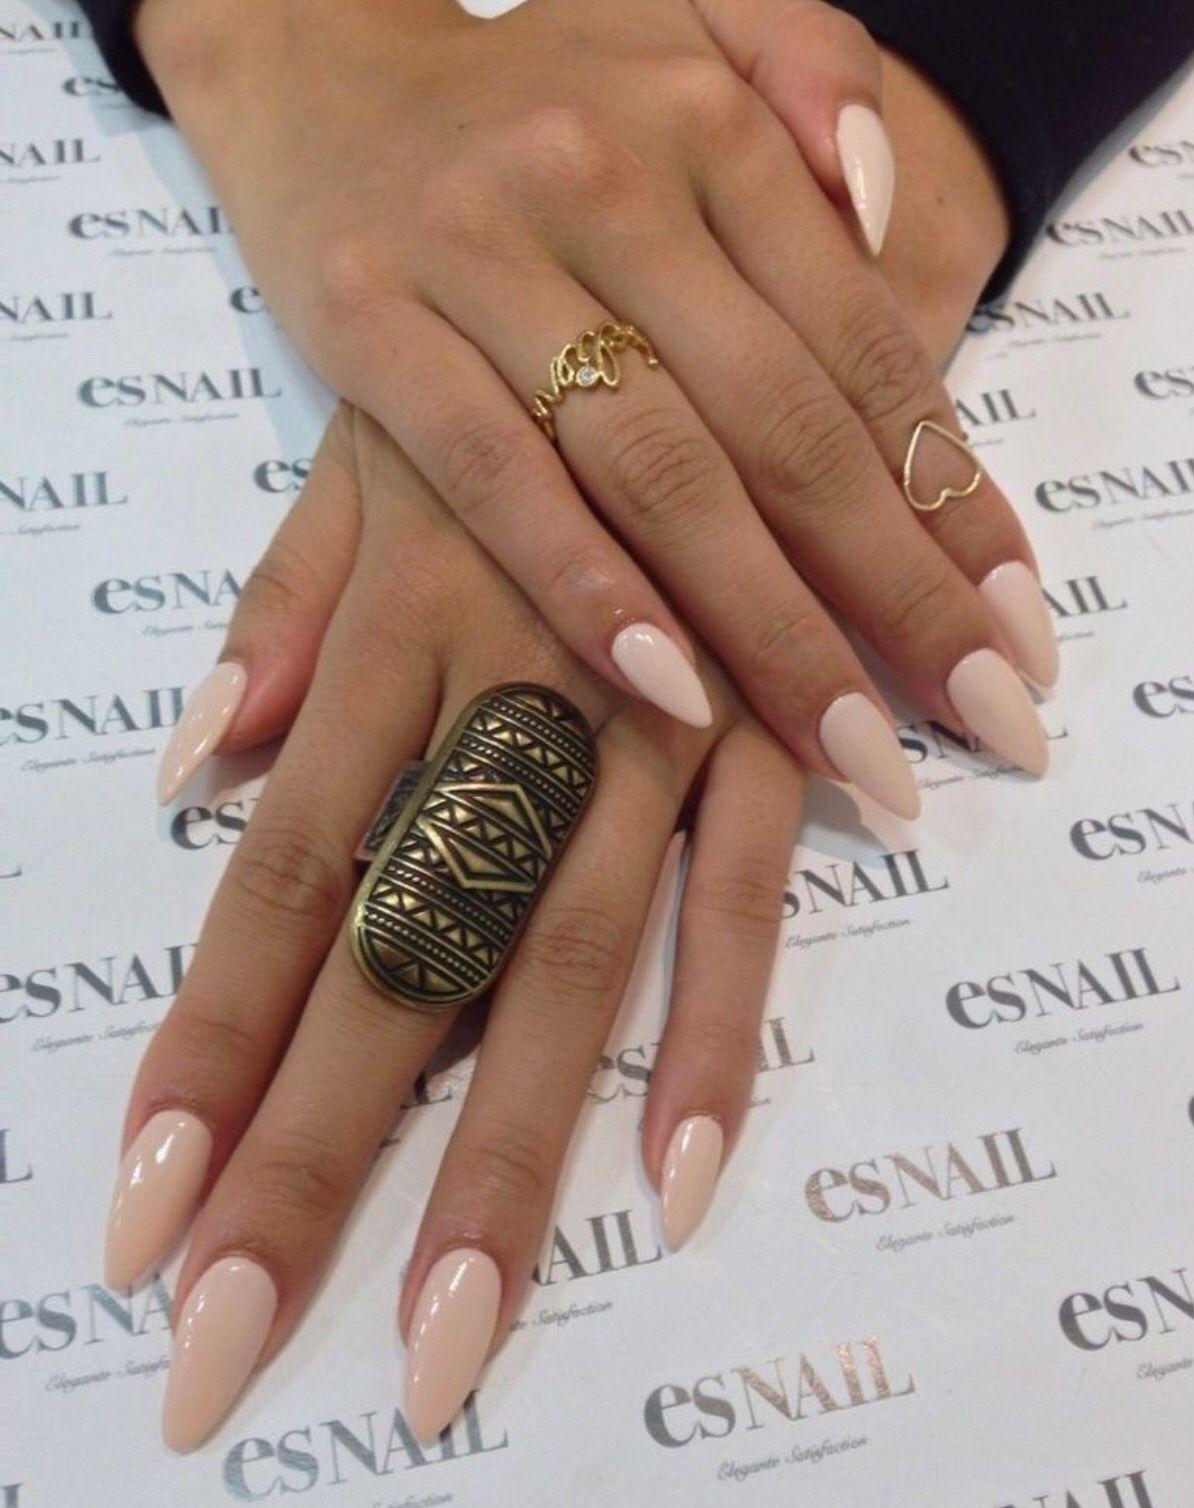 Pin by Amanda Knowles on Makeup   Pinterest   Nail inspo, Makeup and ...